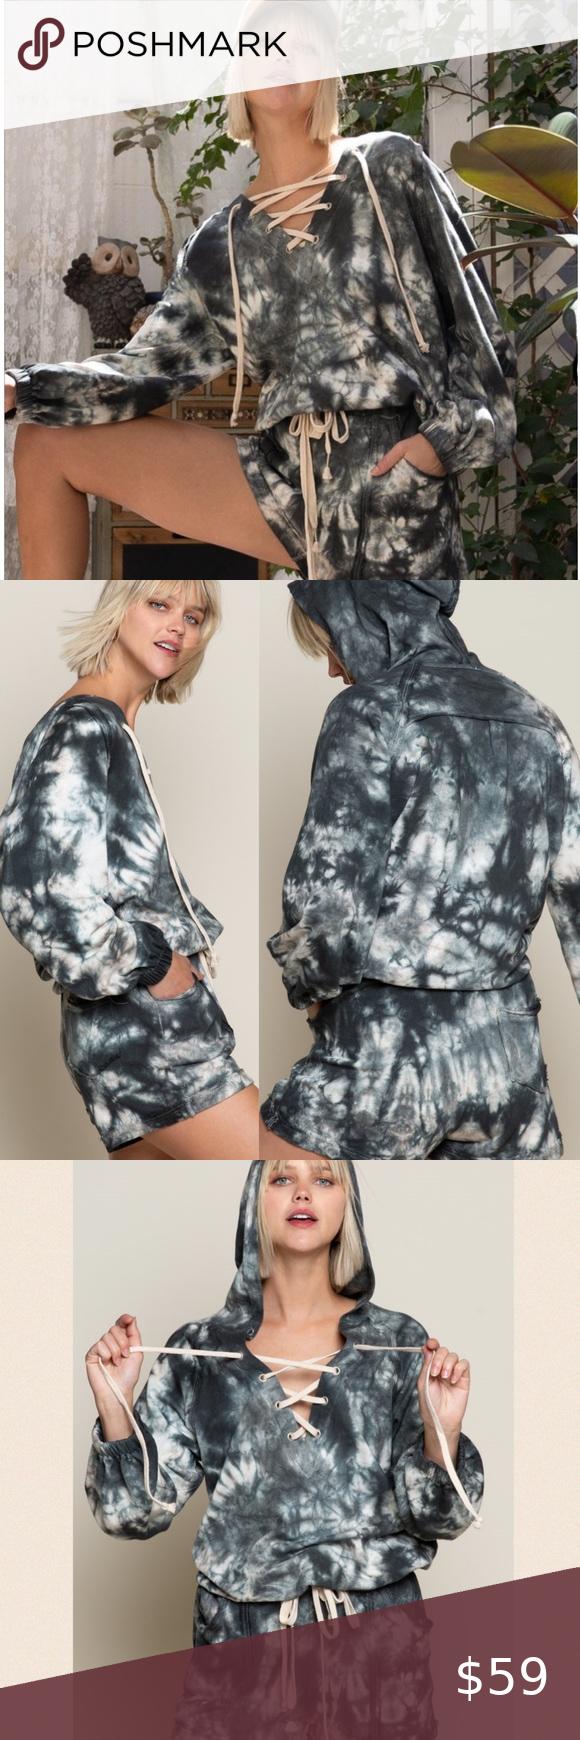 Preorder Indigo Cloud Tie Dye Lace Up Hoodie Tie Dye Clothes Design Lace Up [ 1740 x 580 Pixel ]